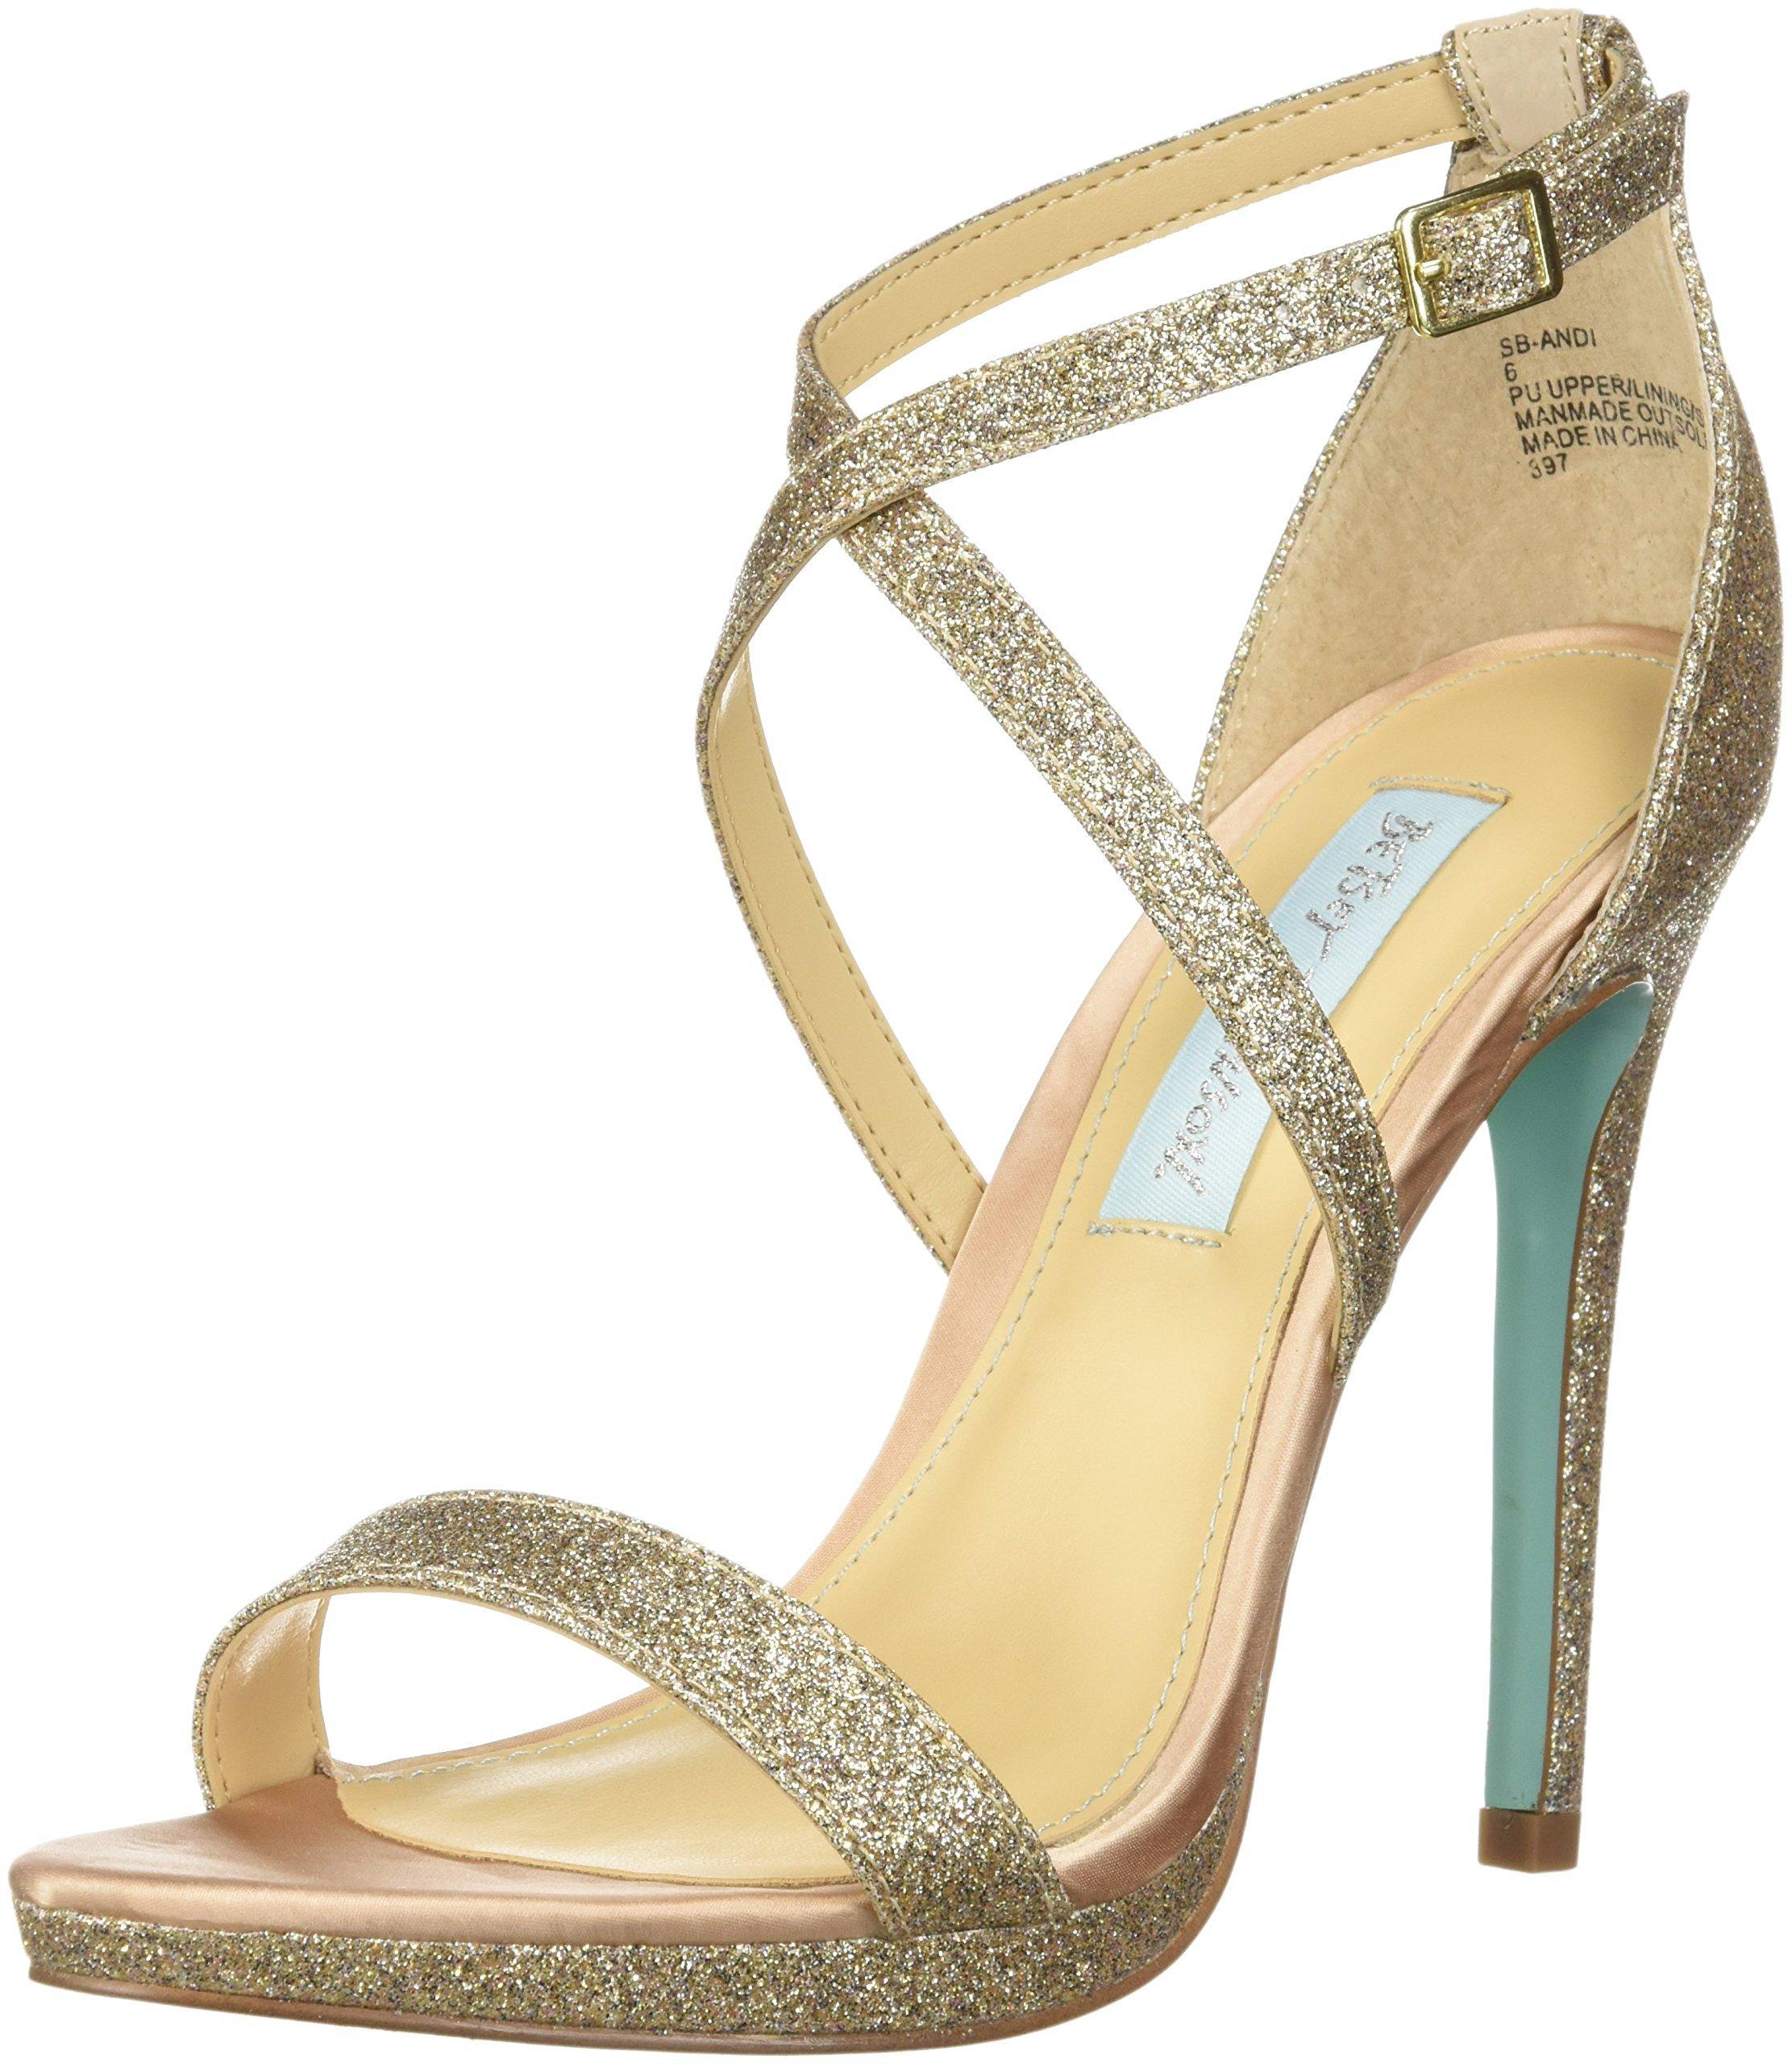 Betsey Johnson Blue Sb-mari Heeled Sandal in Green - Lyst